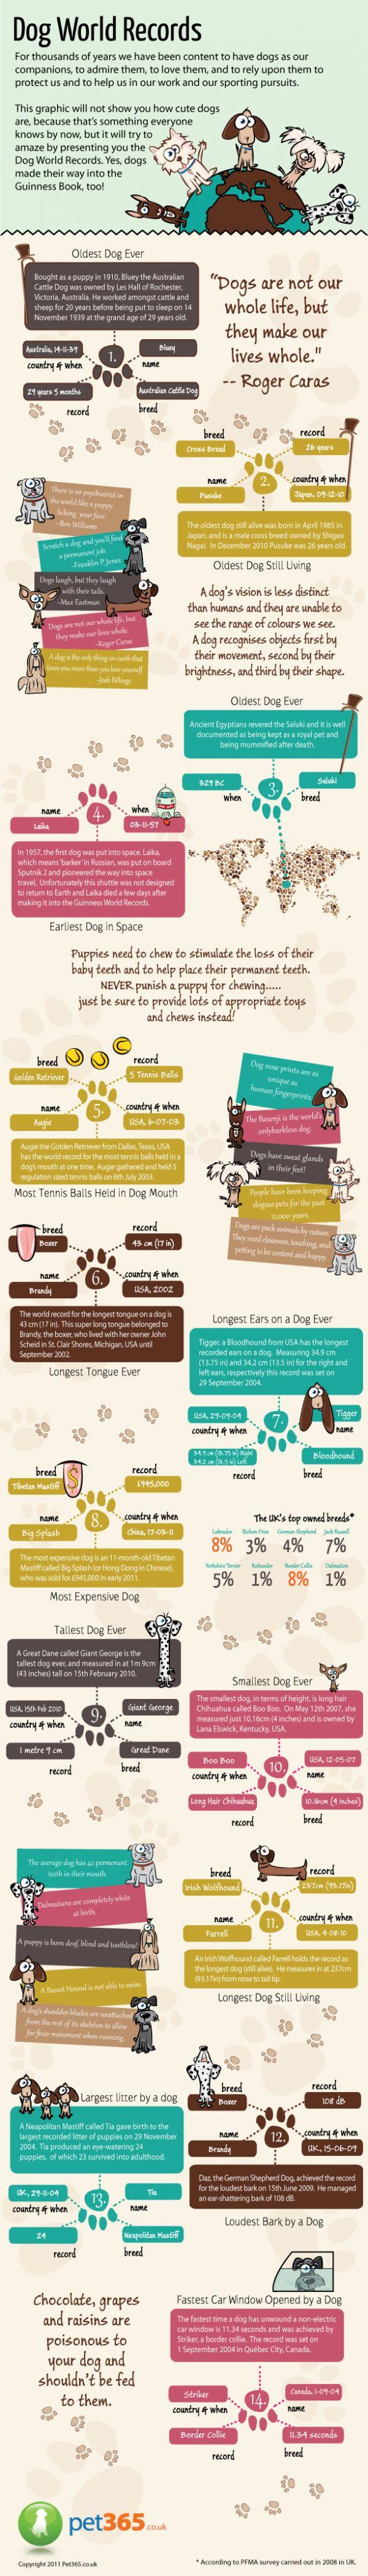 Dog World Records - Infographic